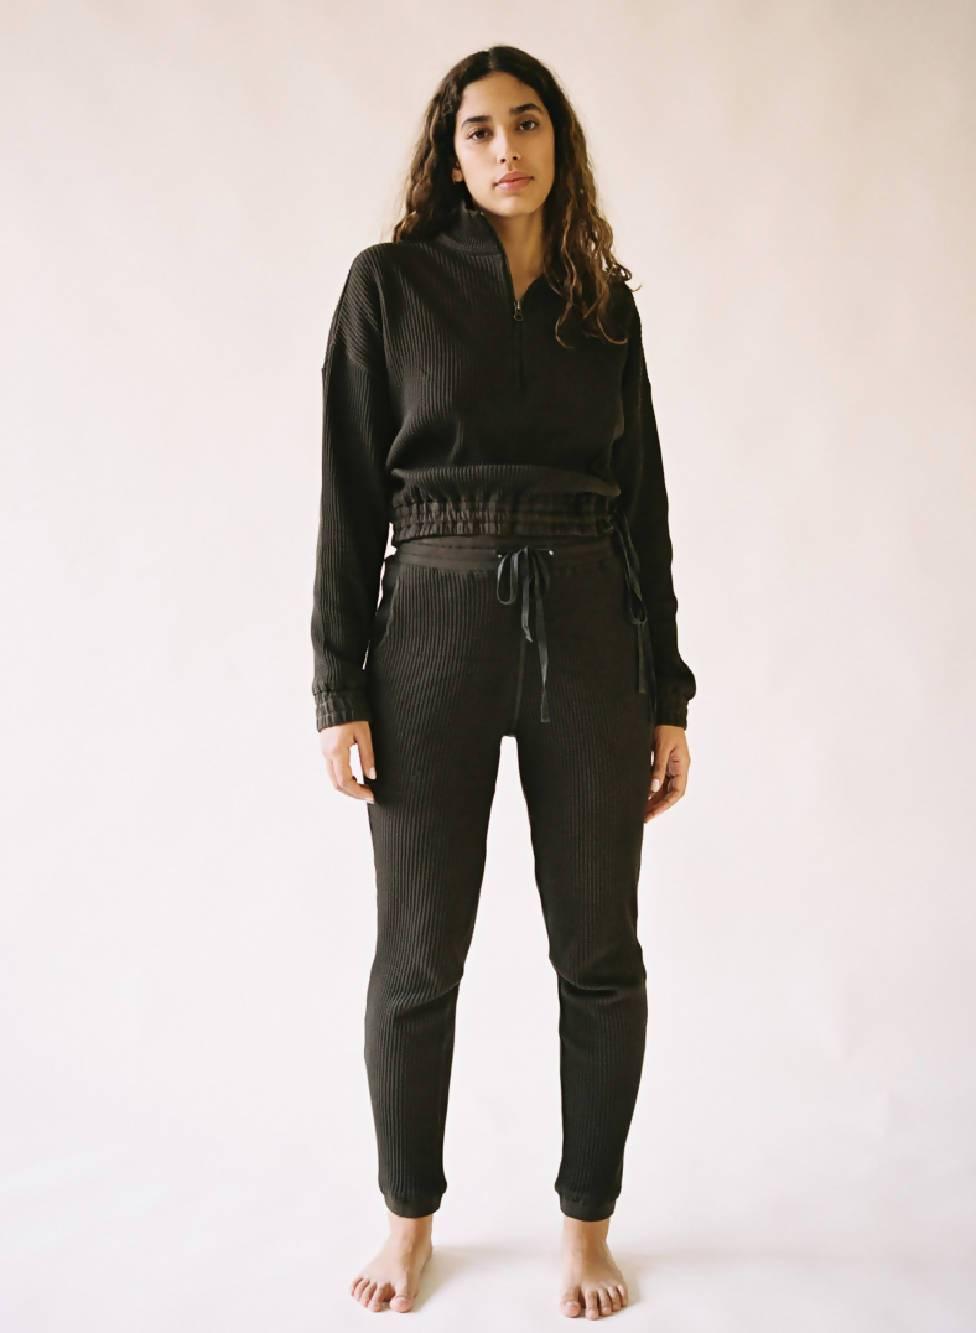 Aniela Parys Black Organic Helios Trousers